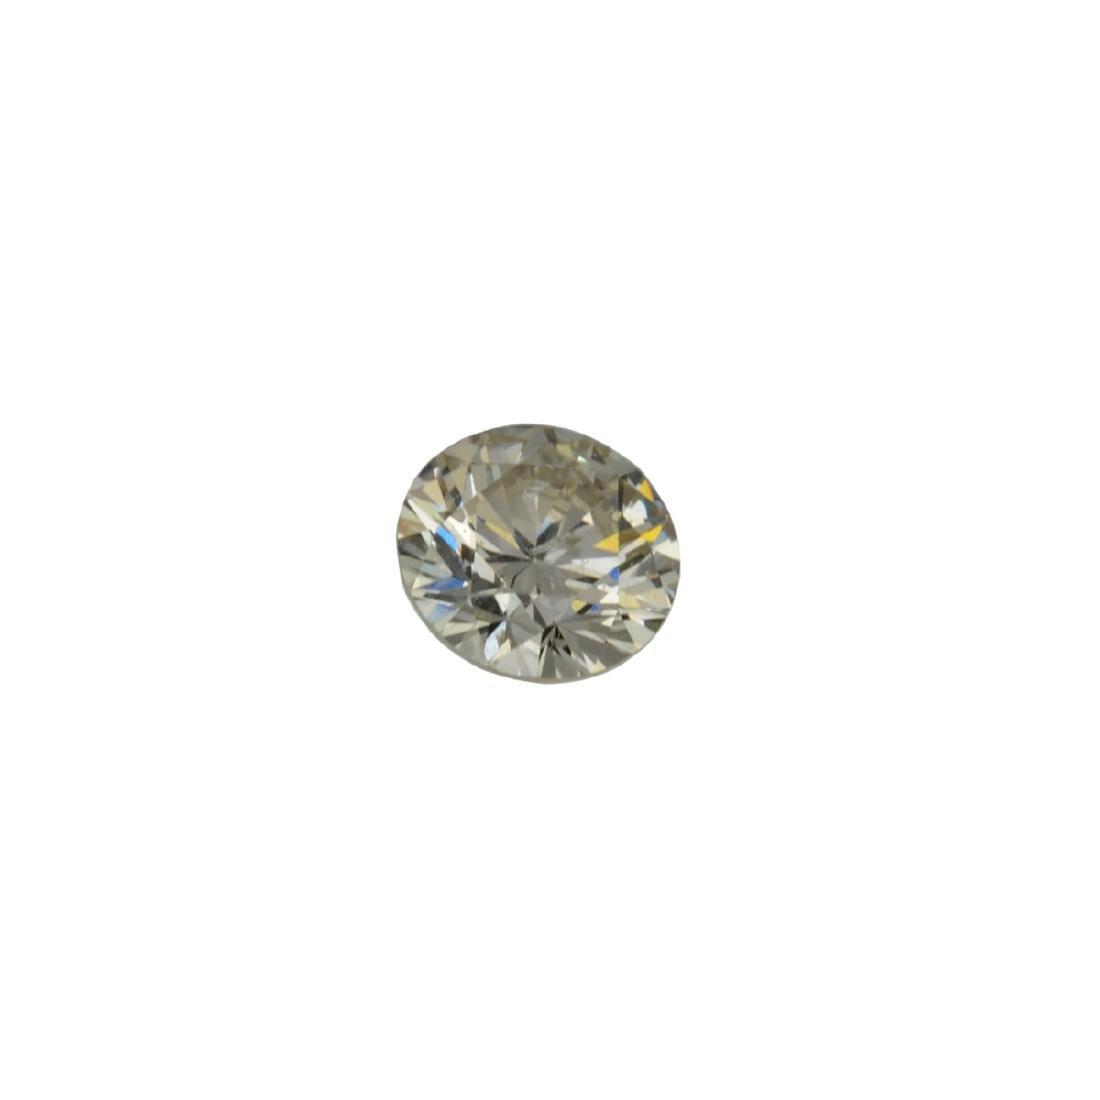 Fine Jewelry GIA Certified 0.52CT Brilliant Round Cut